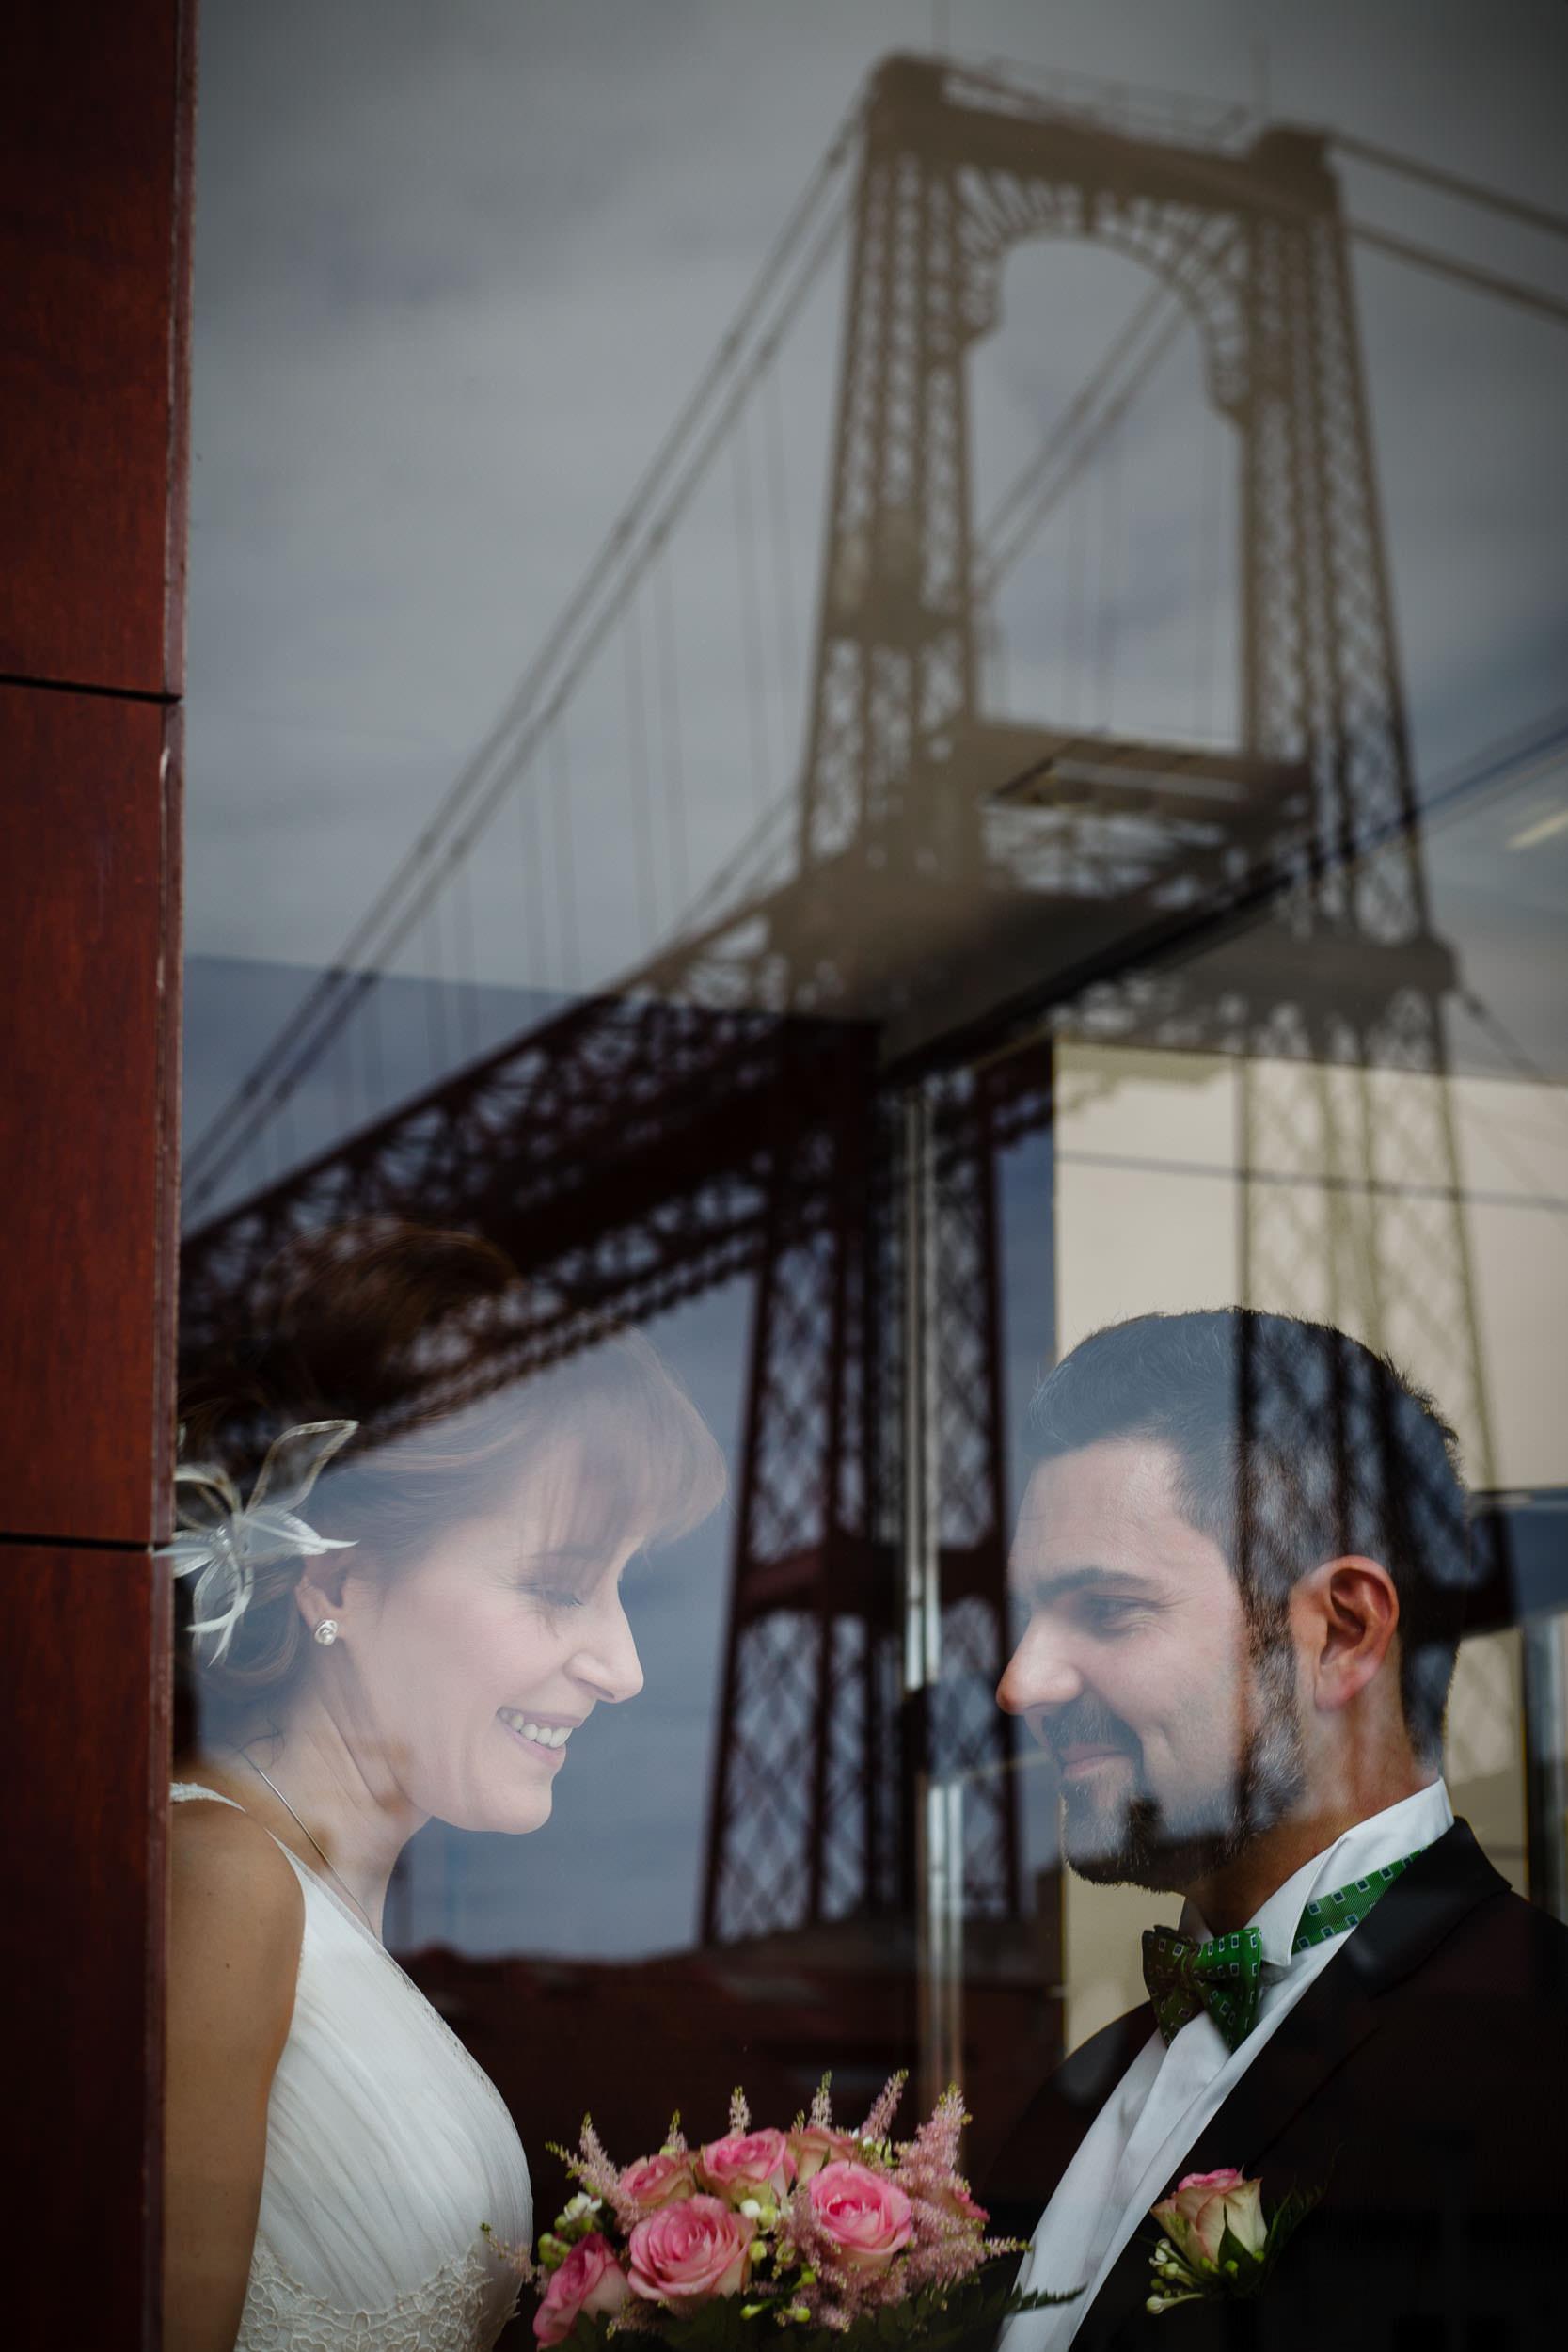 Engagement photography in Portugalete, Basque Country, Spain - James Sturcke  Photographer | sturcke.org_003.jpg